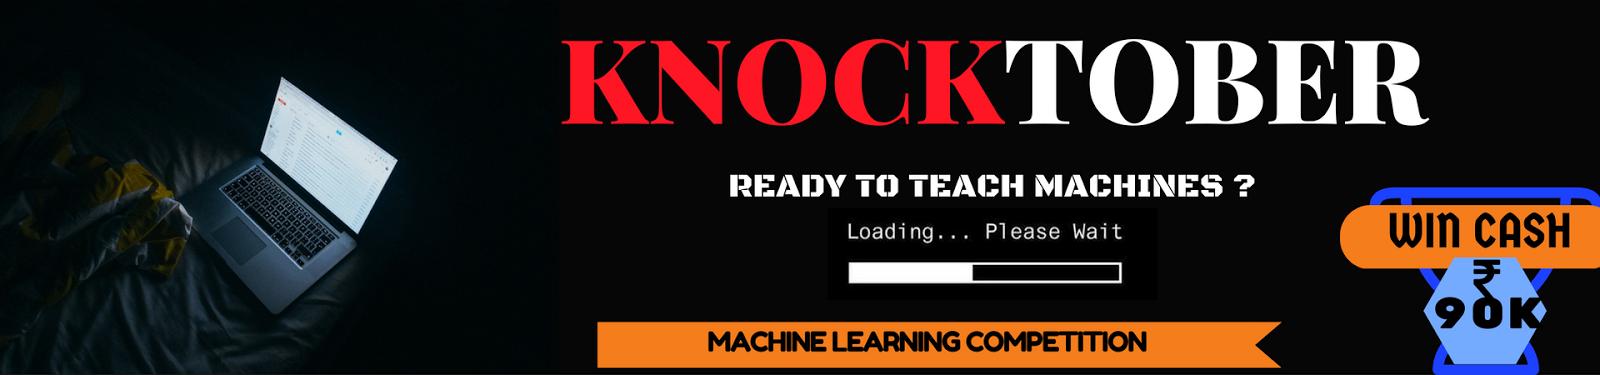 Knocktober - Analytics Vidhya Hack ! | Journey in Data Science